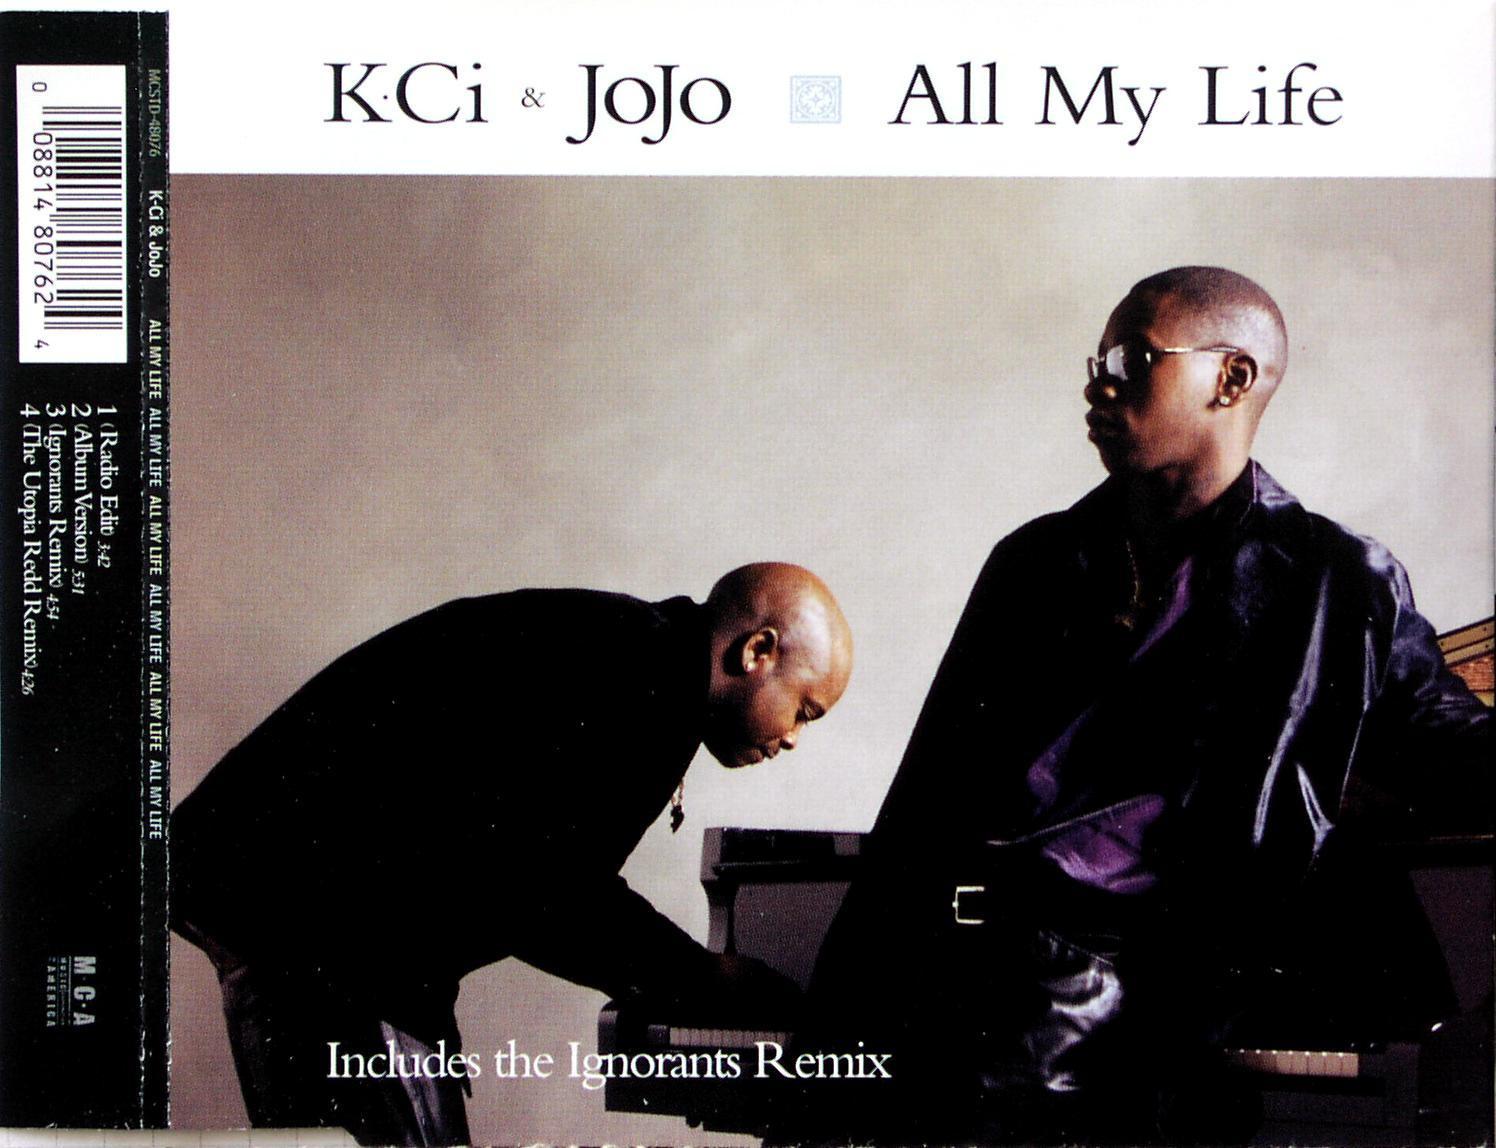 K-CI & JOJO - All My Life - MCD